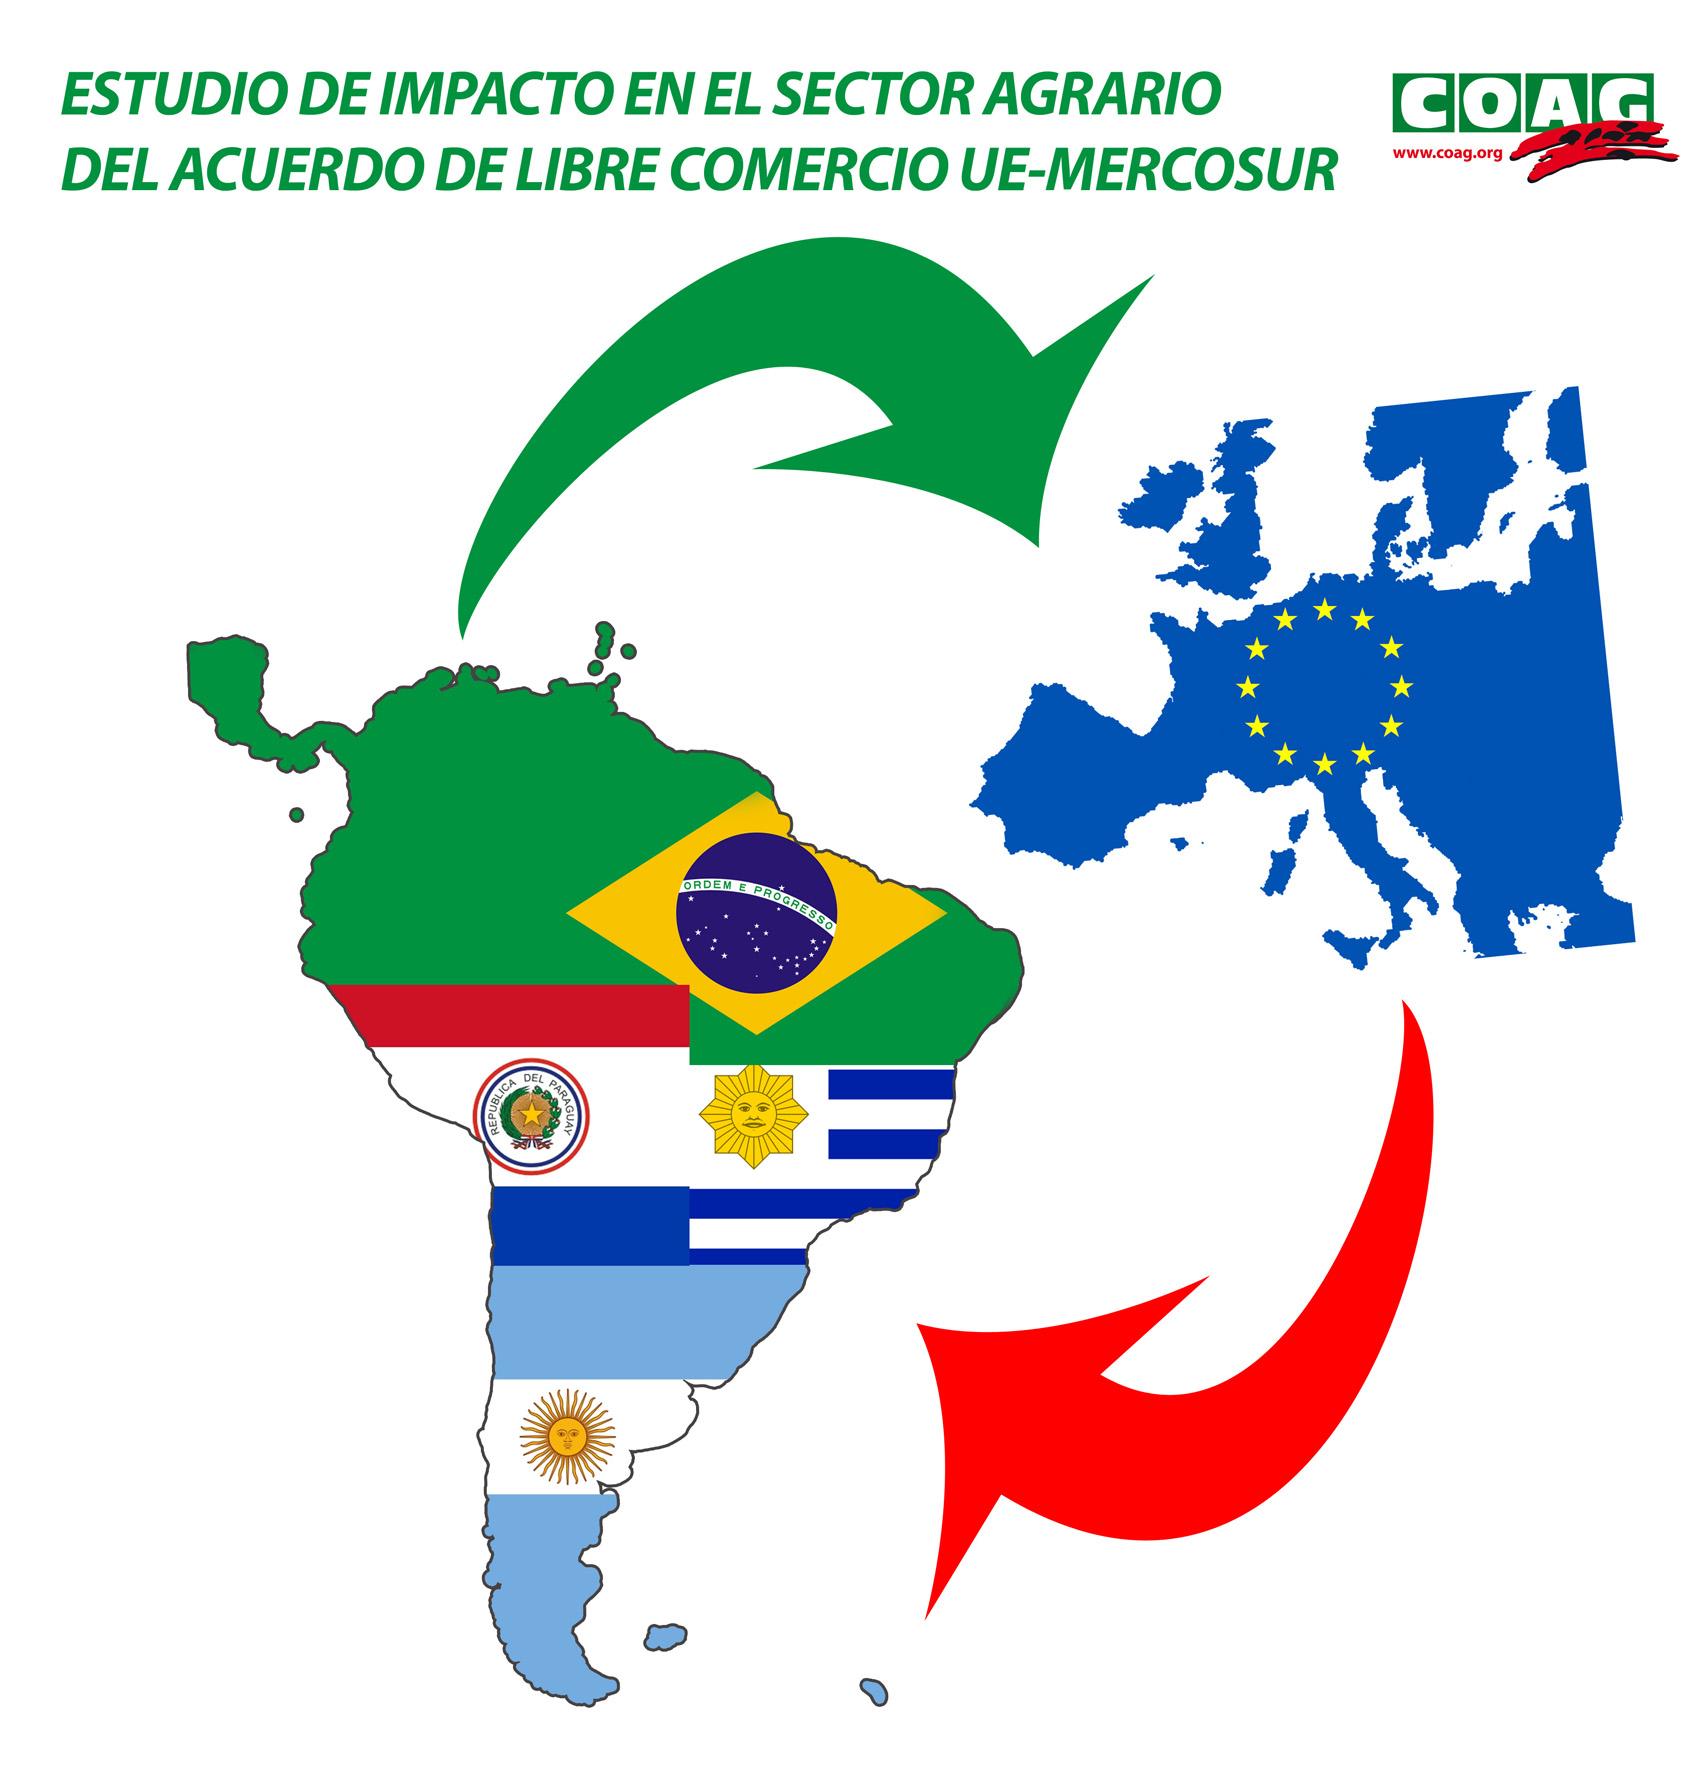 IMAGEN PORTADA ESTUDIO UE-MERCOSUR COAG